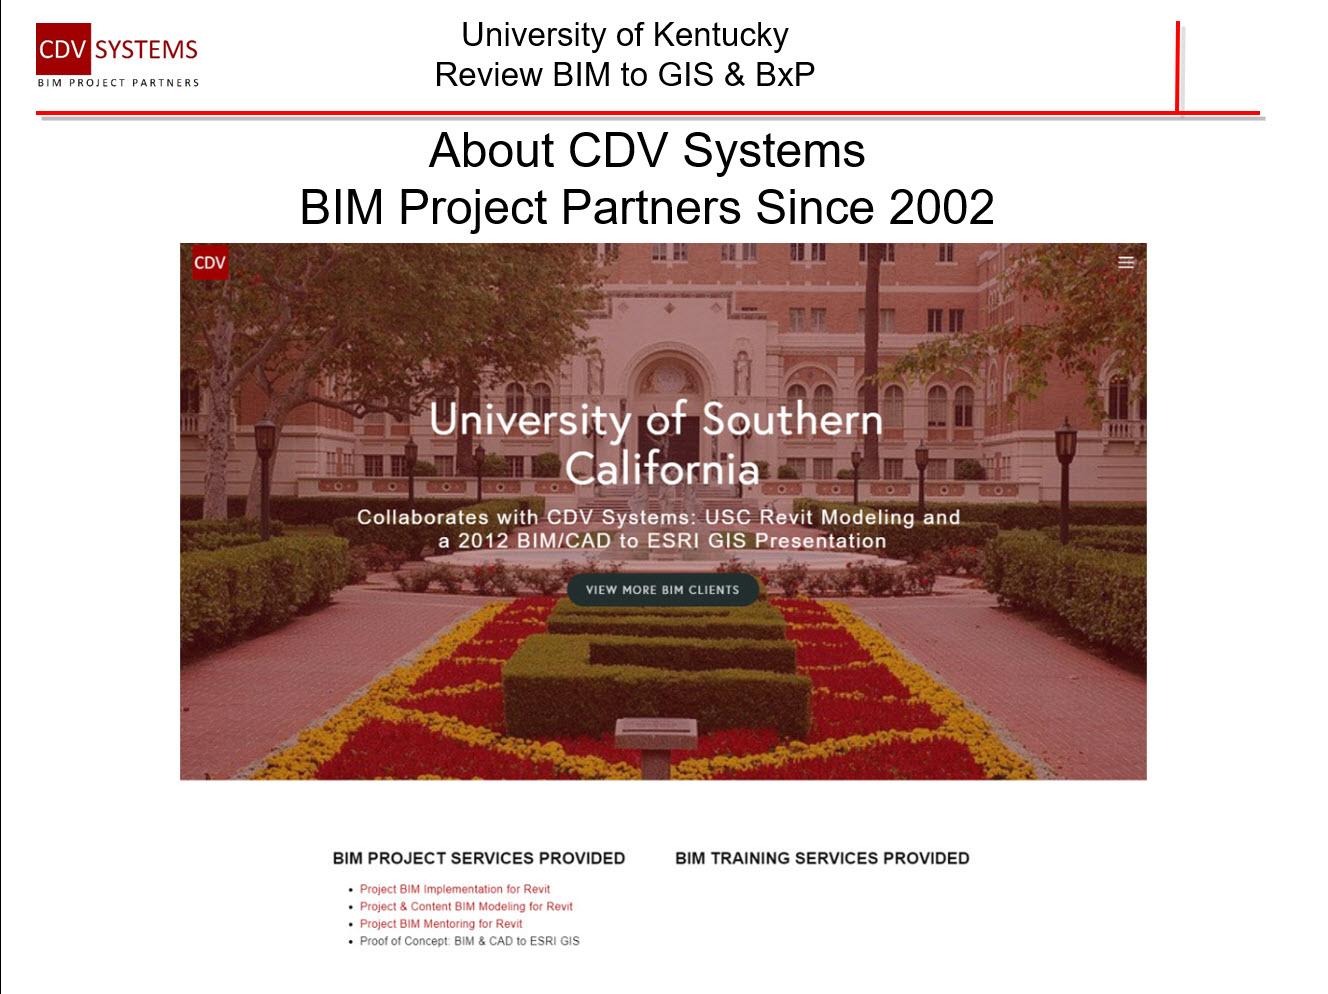 University of Kentucky_001k.jpg